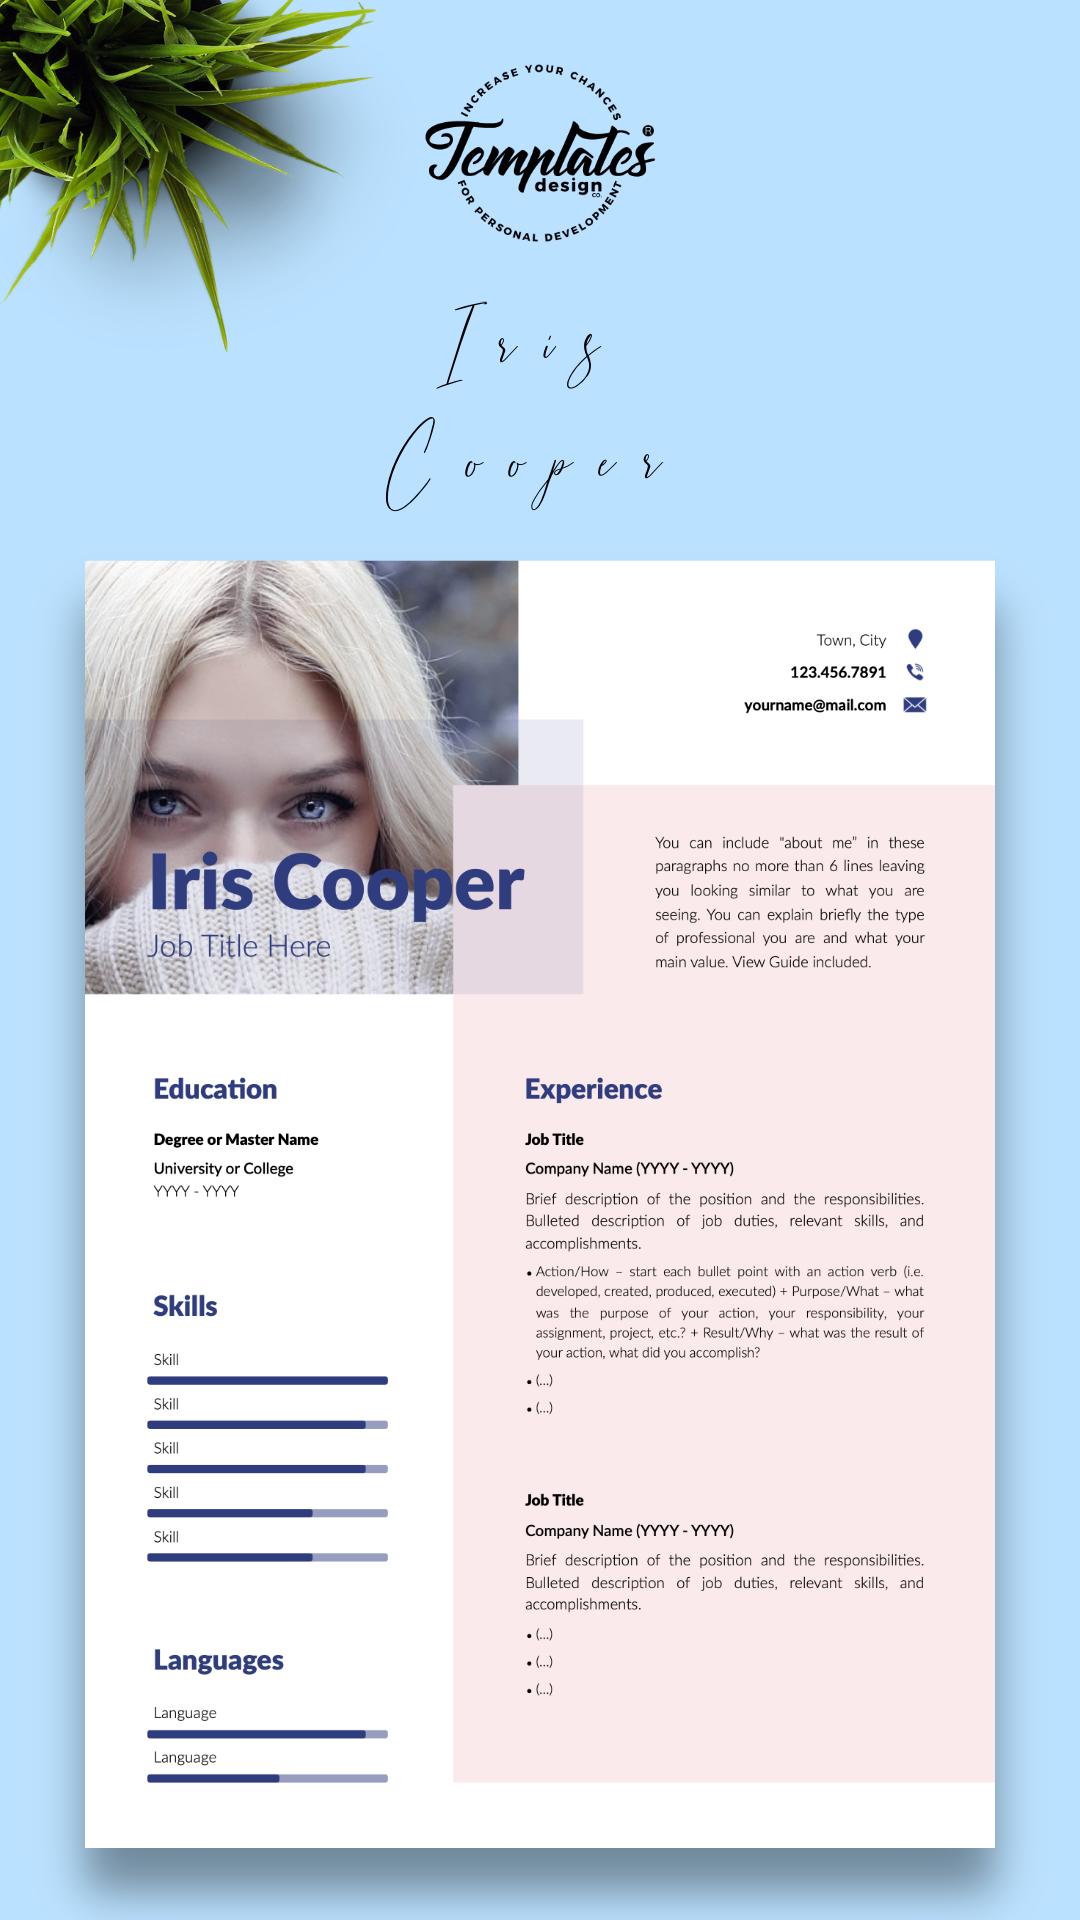 Professionelle Lebenslauf Vorlage Fur Microsoft Word Und Apple Pages Modern Resume Resume Design Template Resume Templates